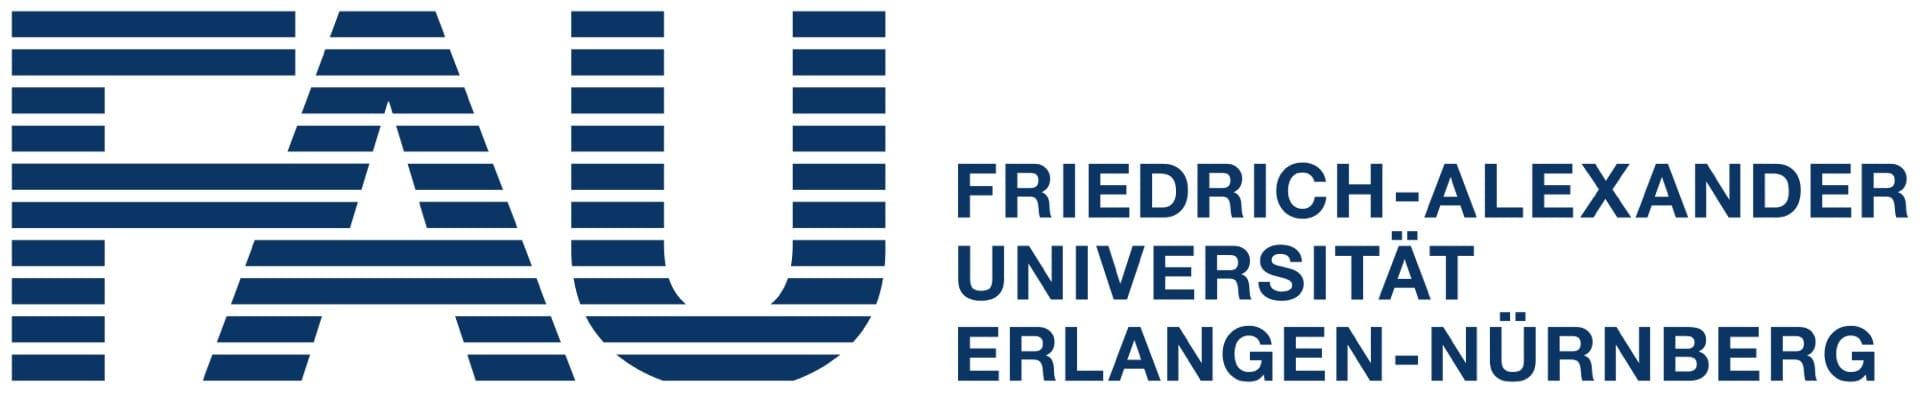 Friedrich-Alexander University